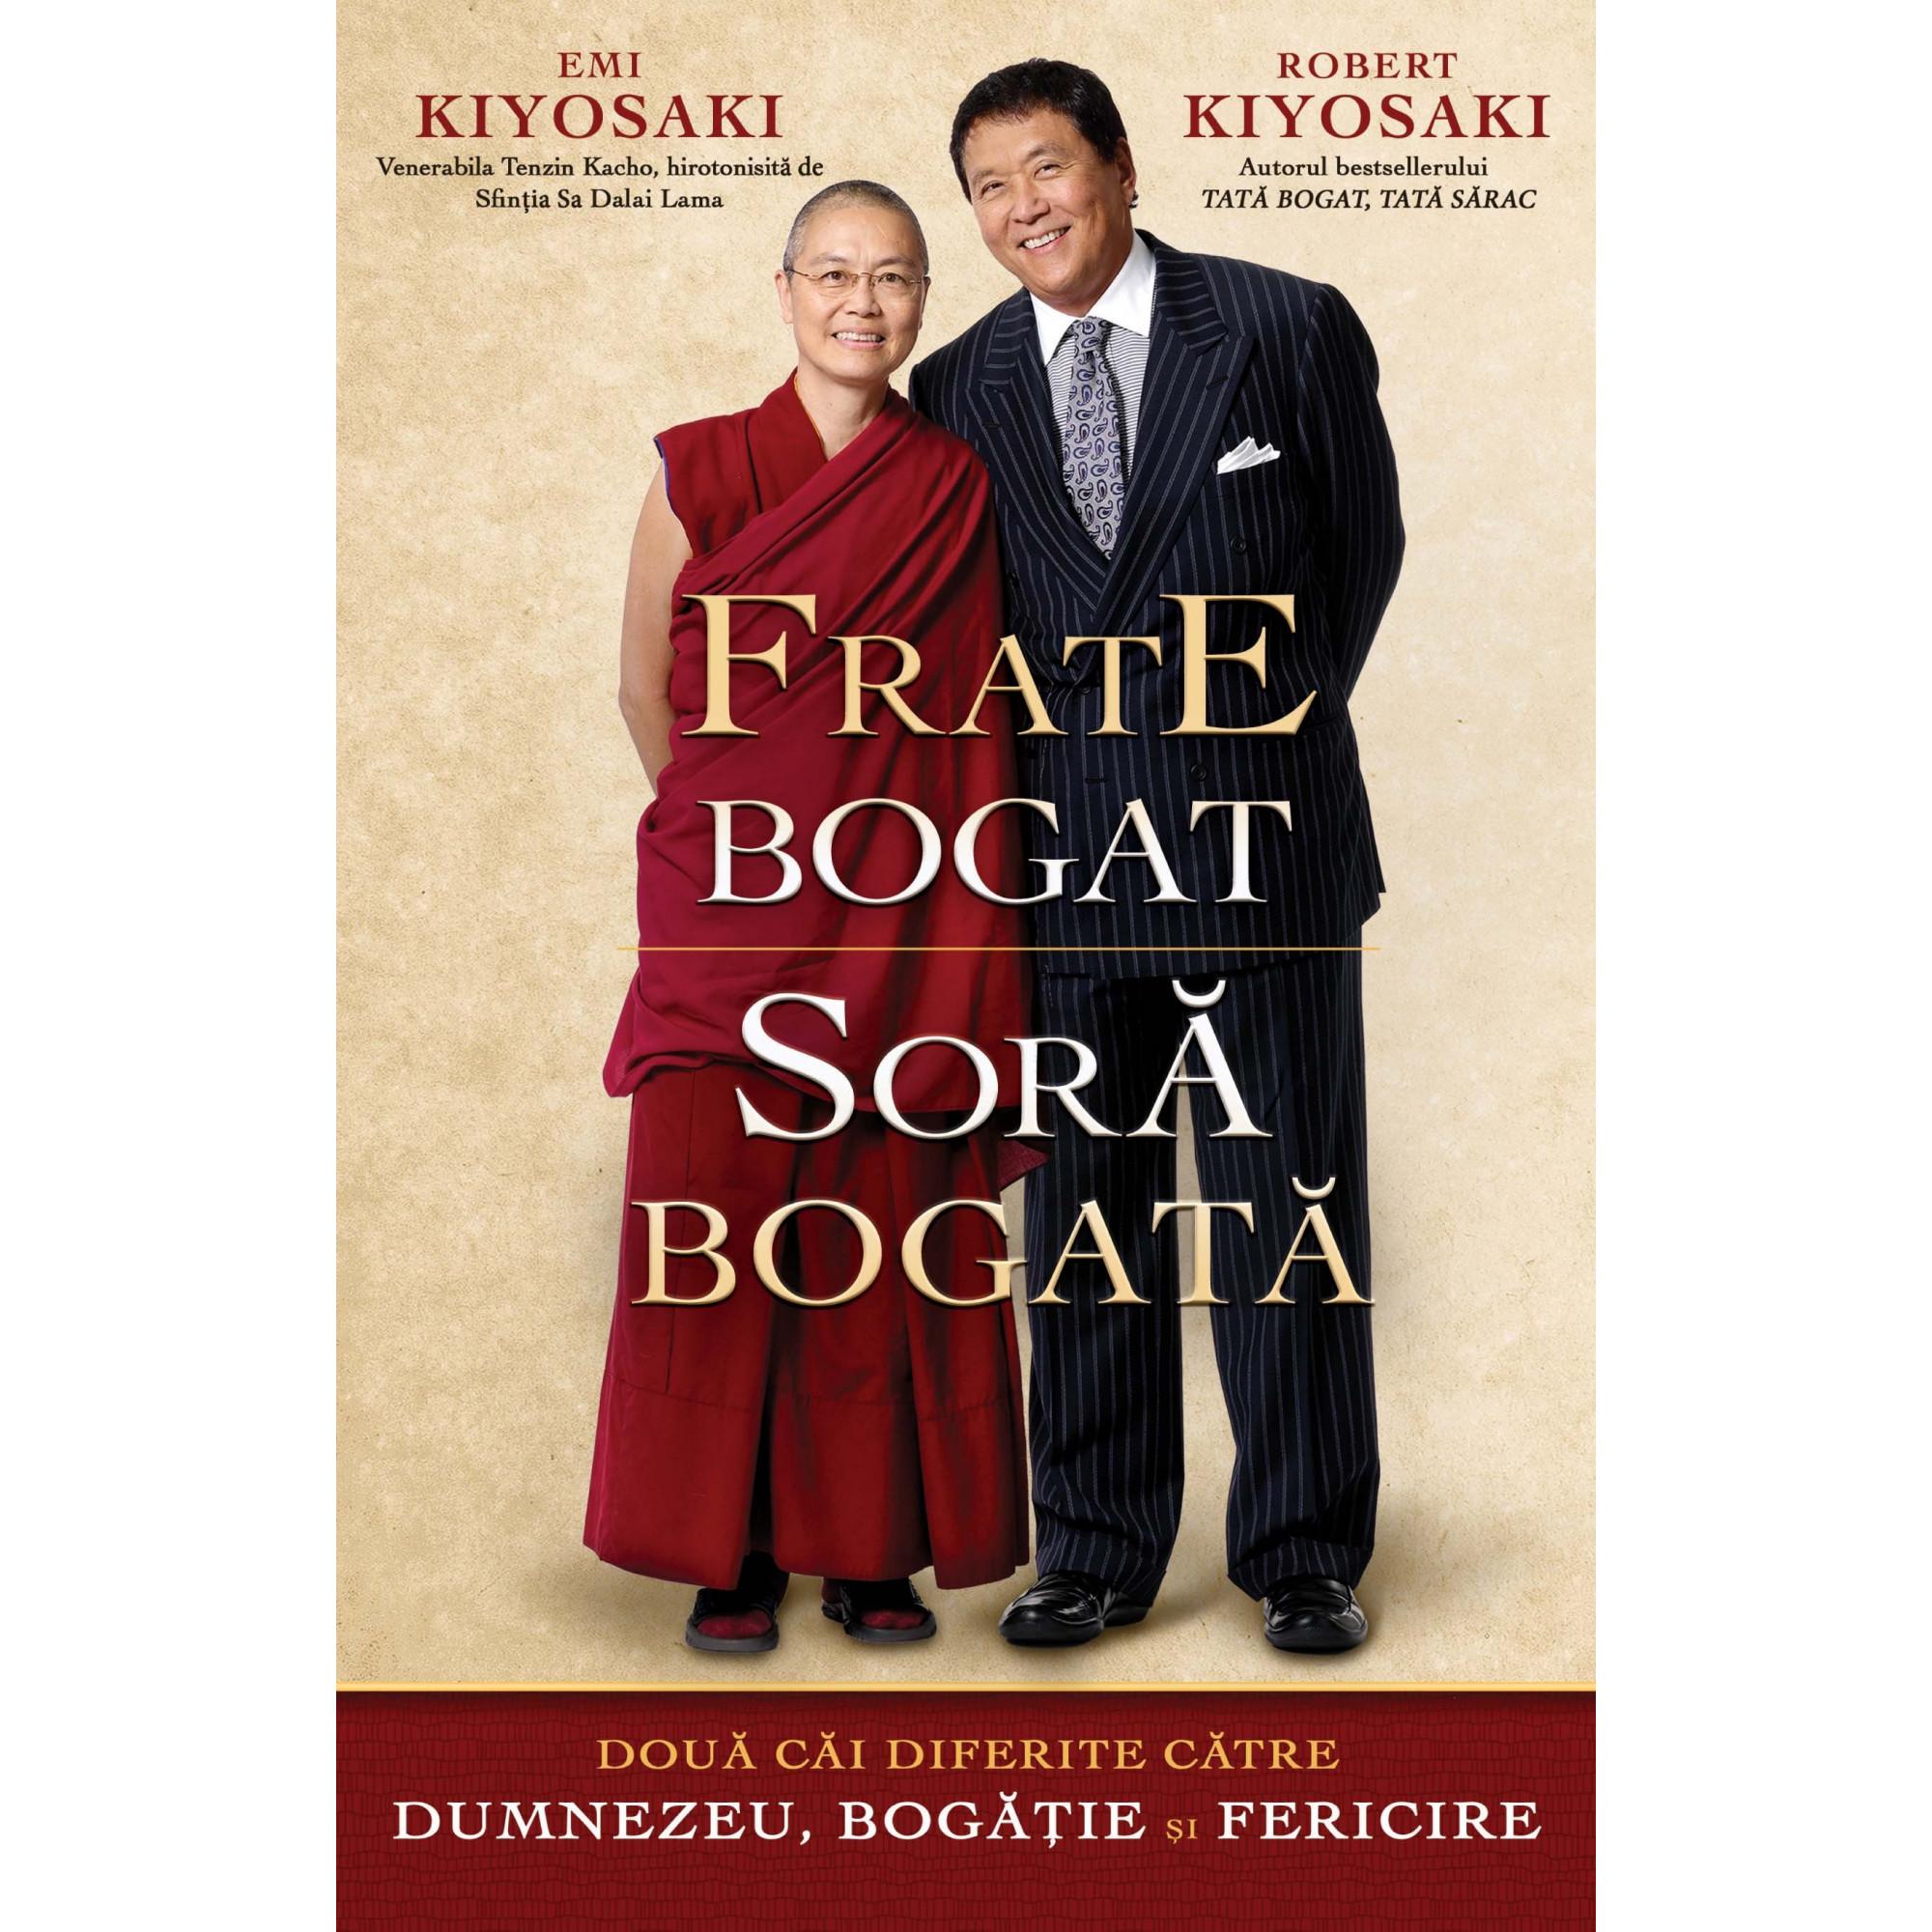 Frate bogat, soră bogată. Două căi diferite către Dumnezeu, bogăție și fericire; Robert Kiyosaki si Emi Kiyosaki (Venerabila Tenzin Kacho)